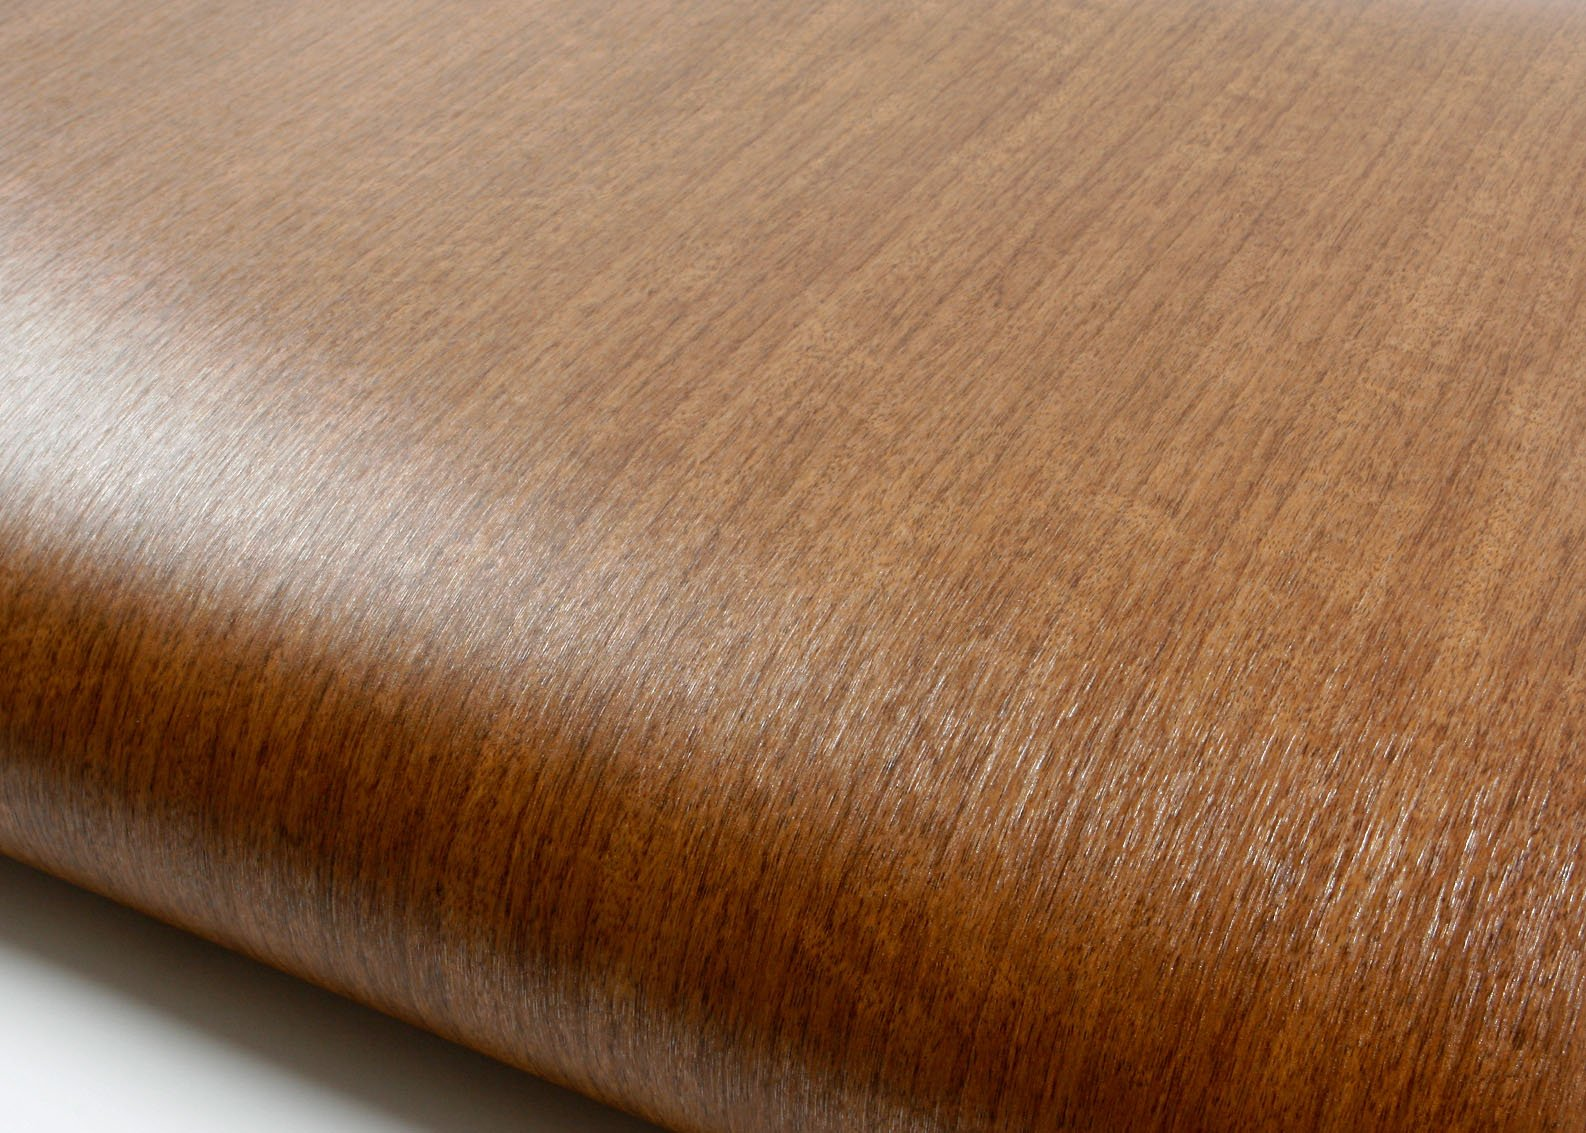 ROSEROSA Peel & Stick Backsplash Pine Chestnut Dream Wood Textured Vinyl Contact Paper Self-adhesive Wallpaper Shelf Liner Table and Door Reform (PG4096-3 : 2.00 Feet X 6.56 Feet)